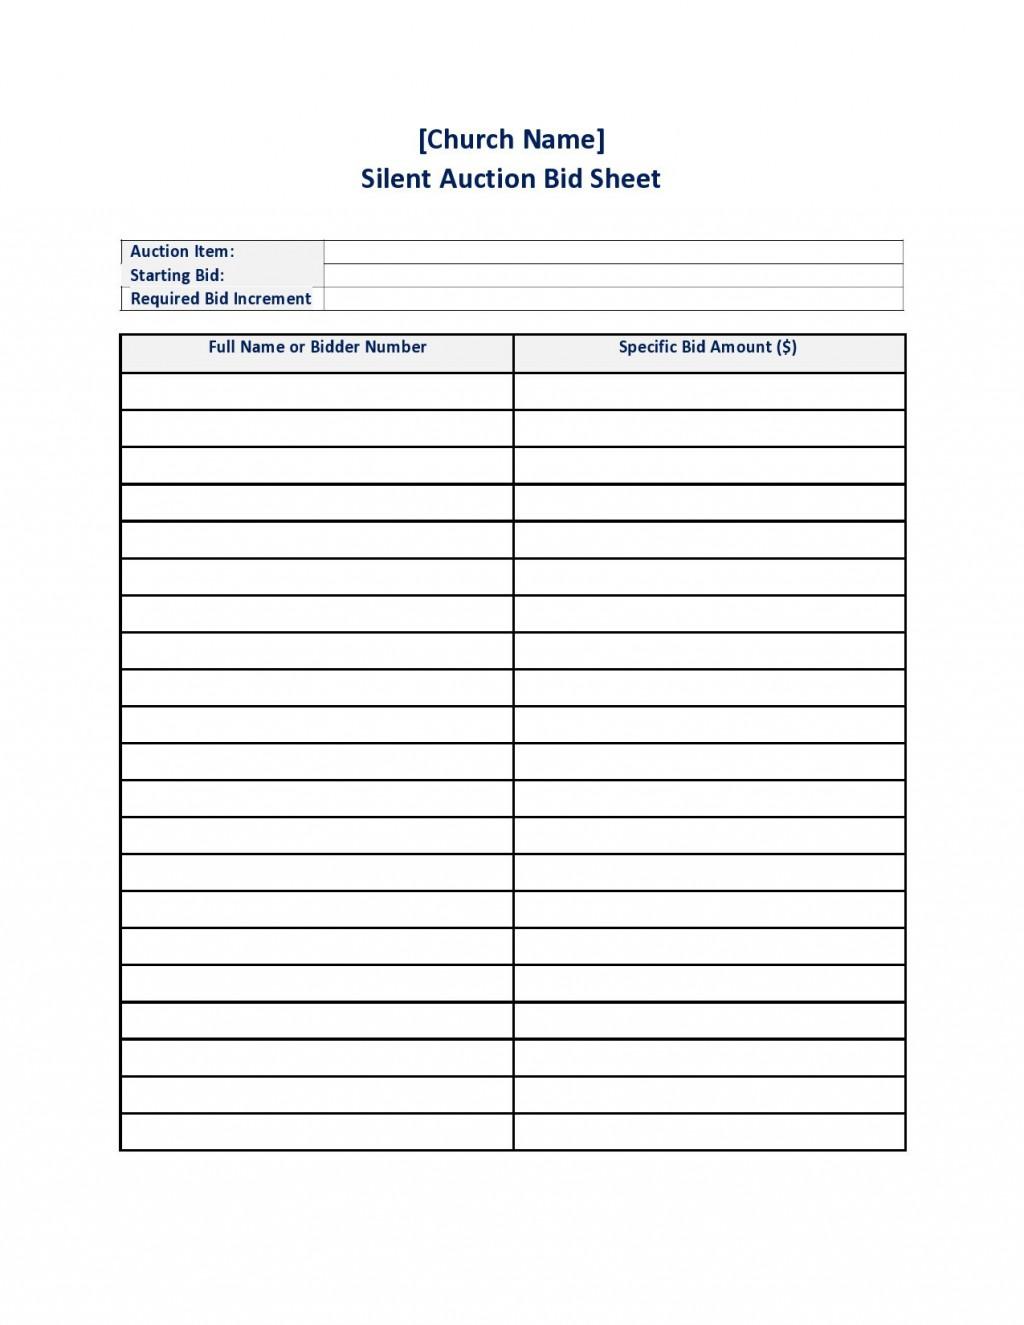 002 Dreaded Silent Auction Bid Sheet Template Free High Def  Pdf DownloadLarge